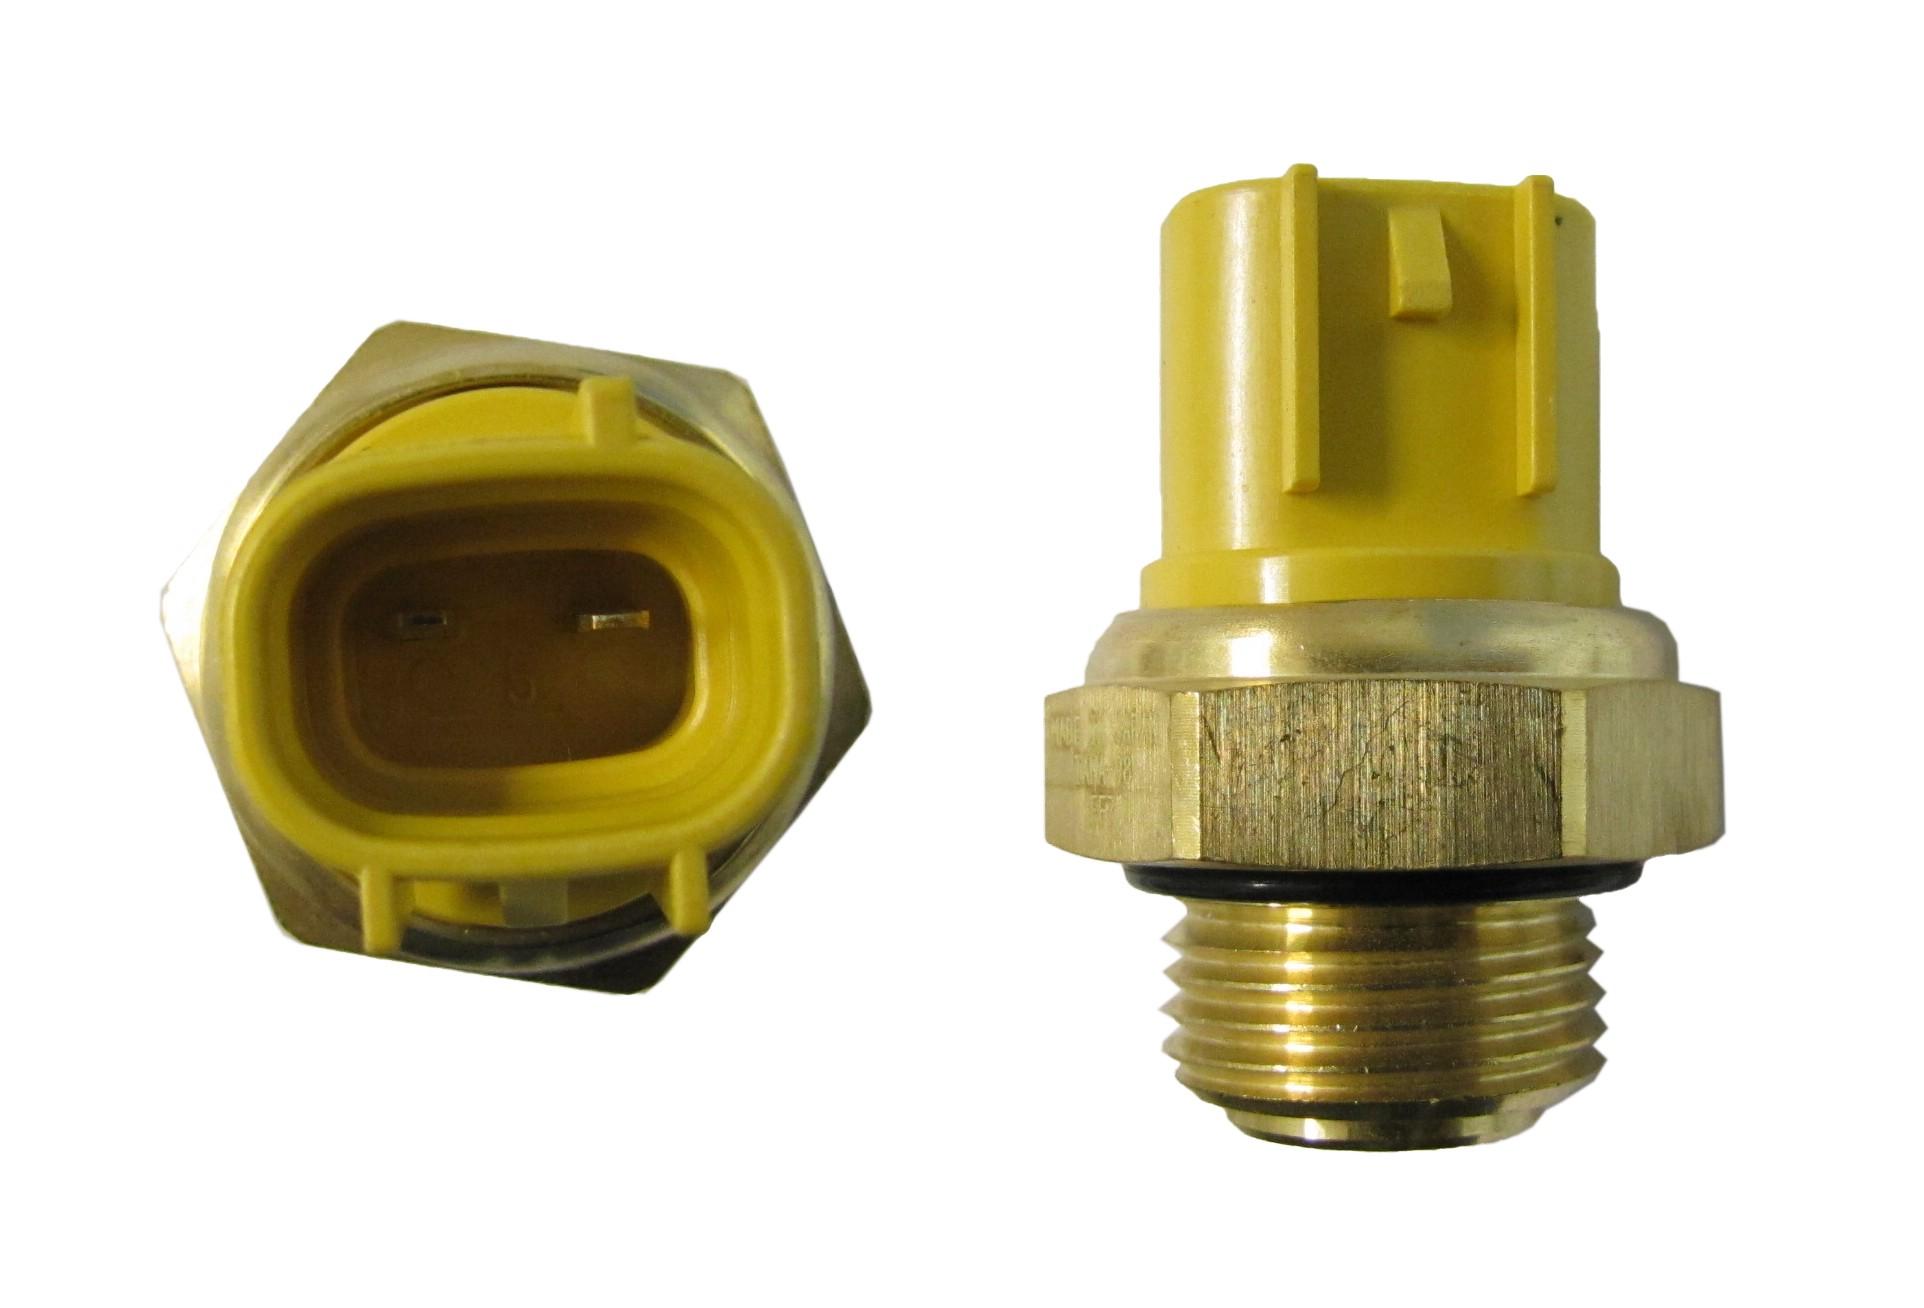 2FastMoto Kawasaki Thermo Fan Switch Sensor ZX600 700 900 1000 1100 27010-1202